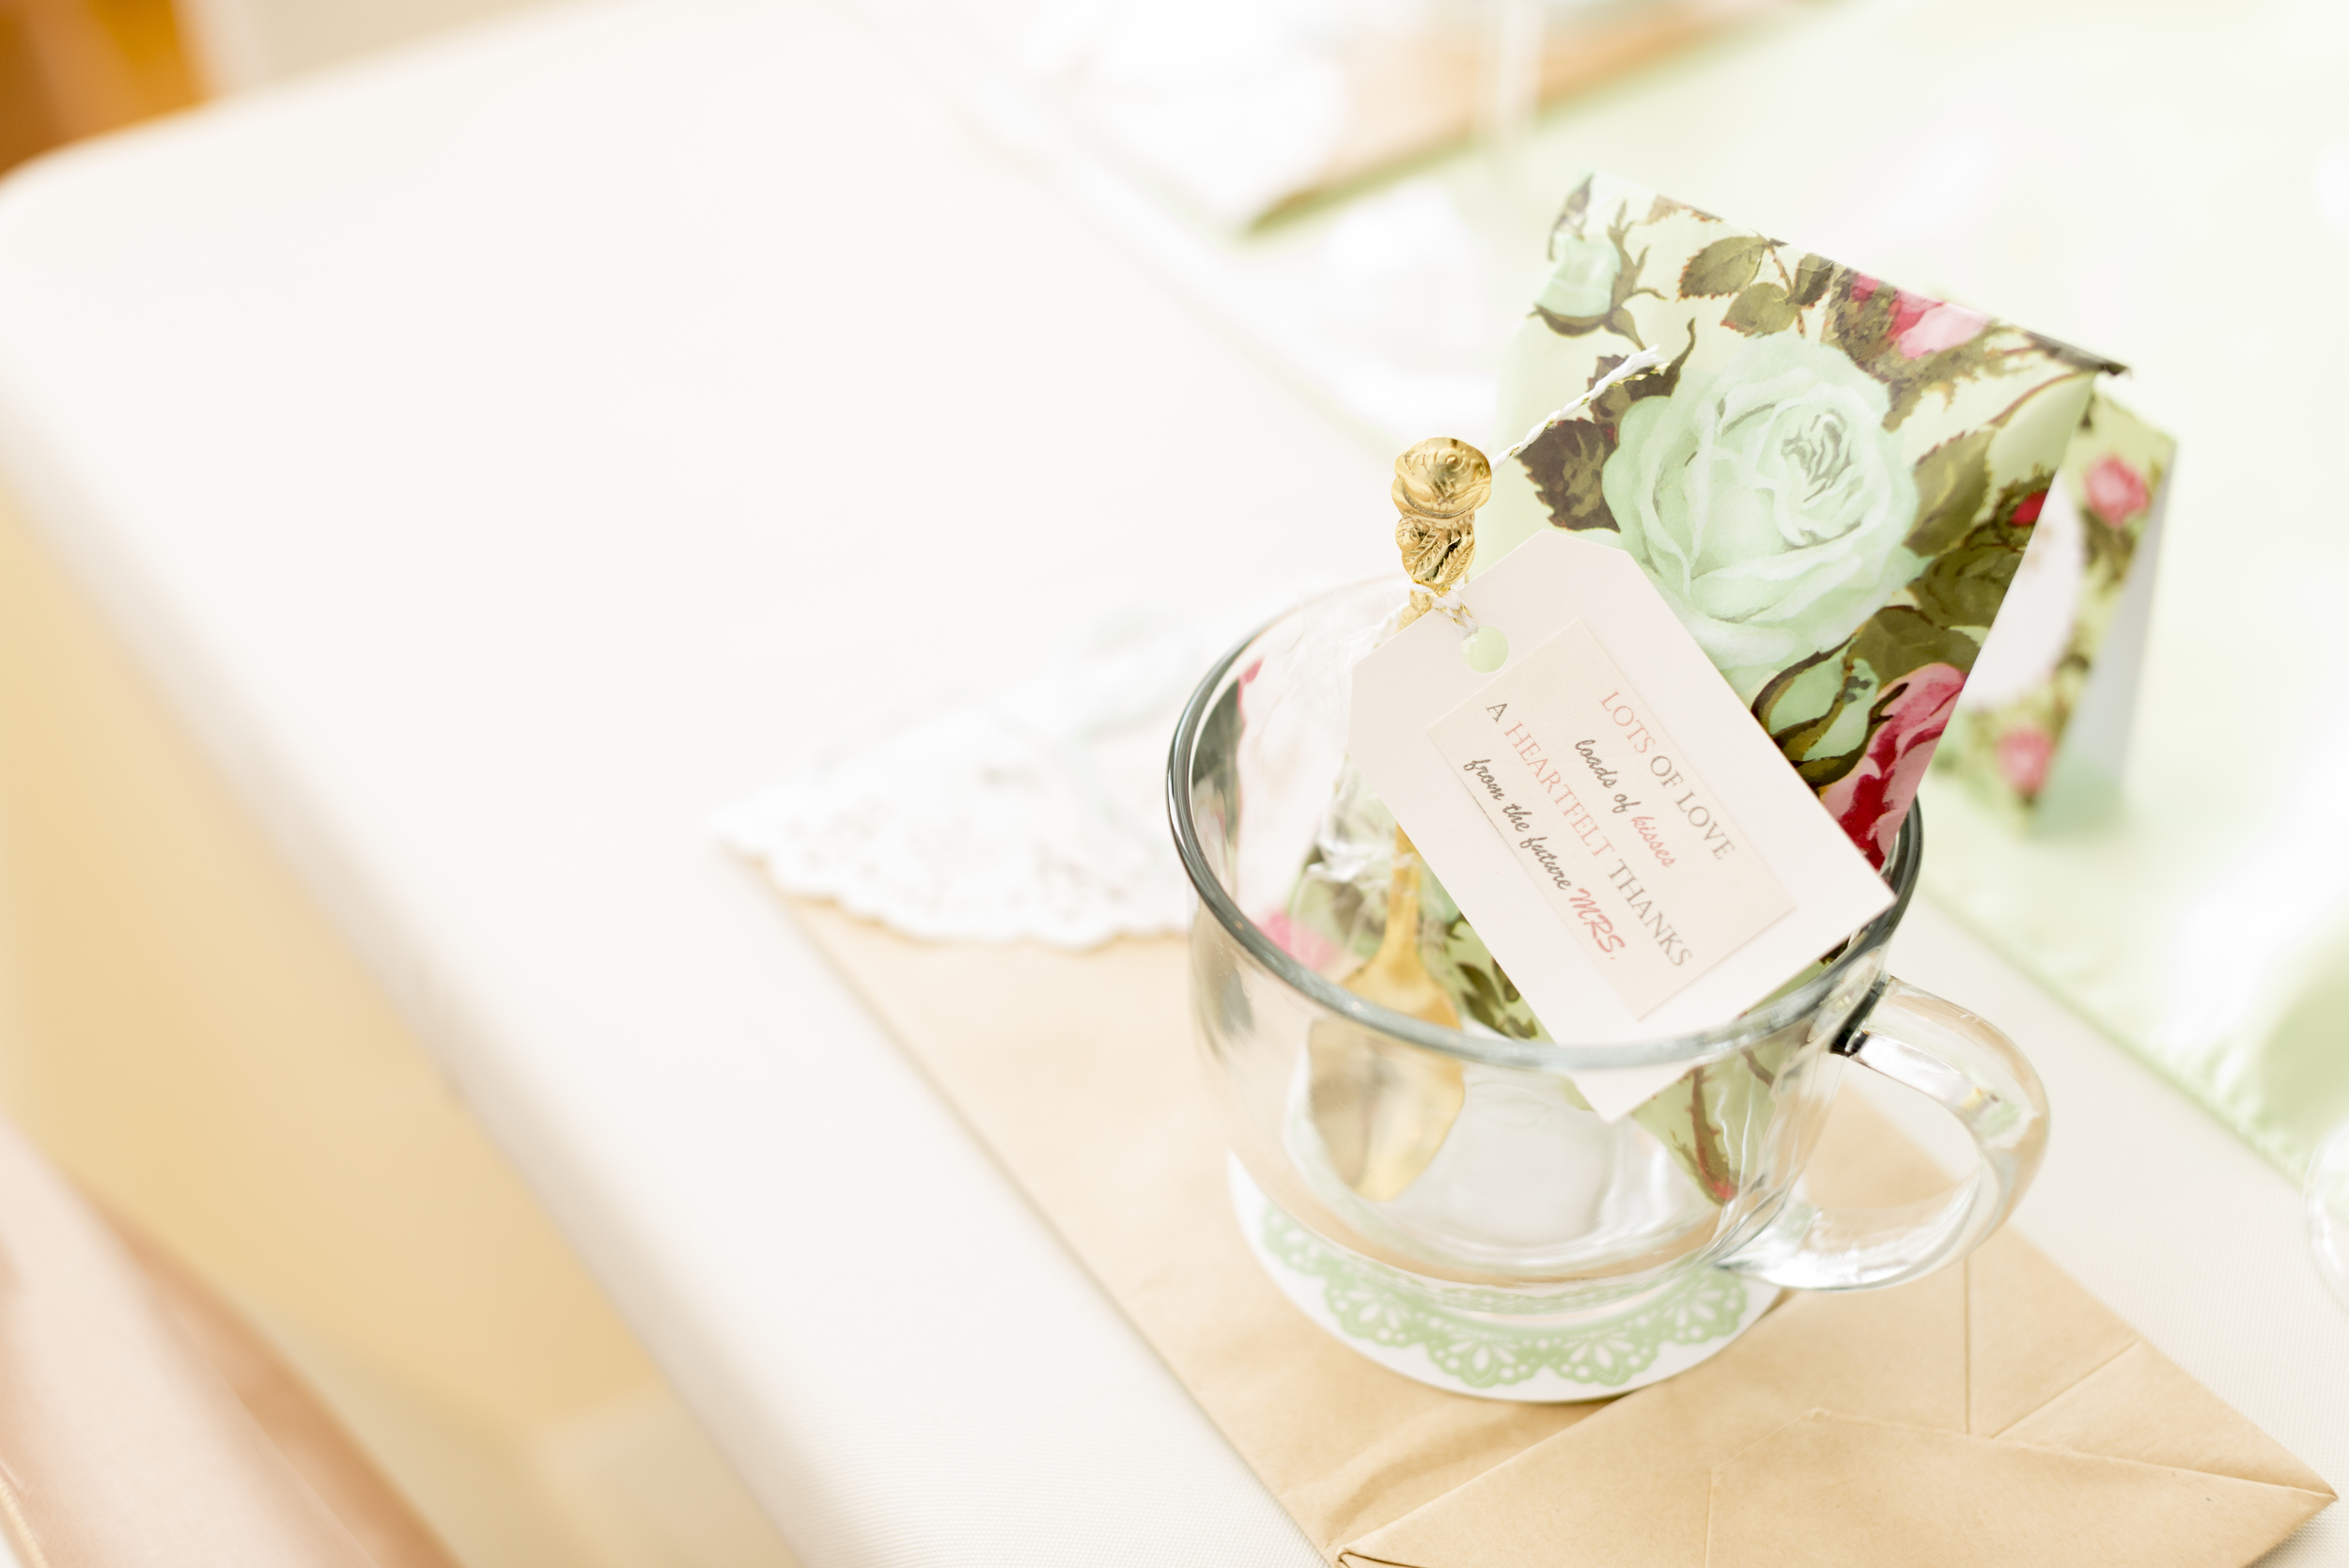 BRIDAL SHOWER TEA PARTY AT THE LIL EPIC STUDIO — Lil Epic Design